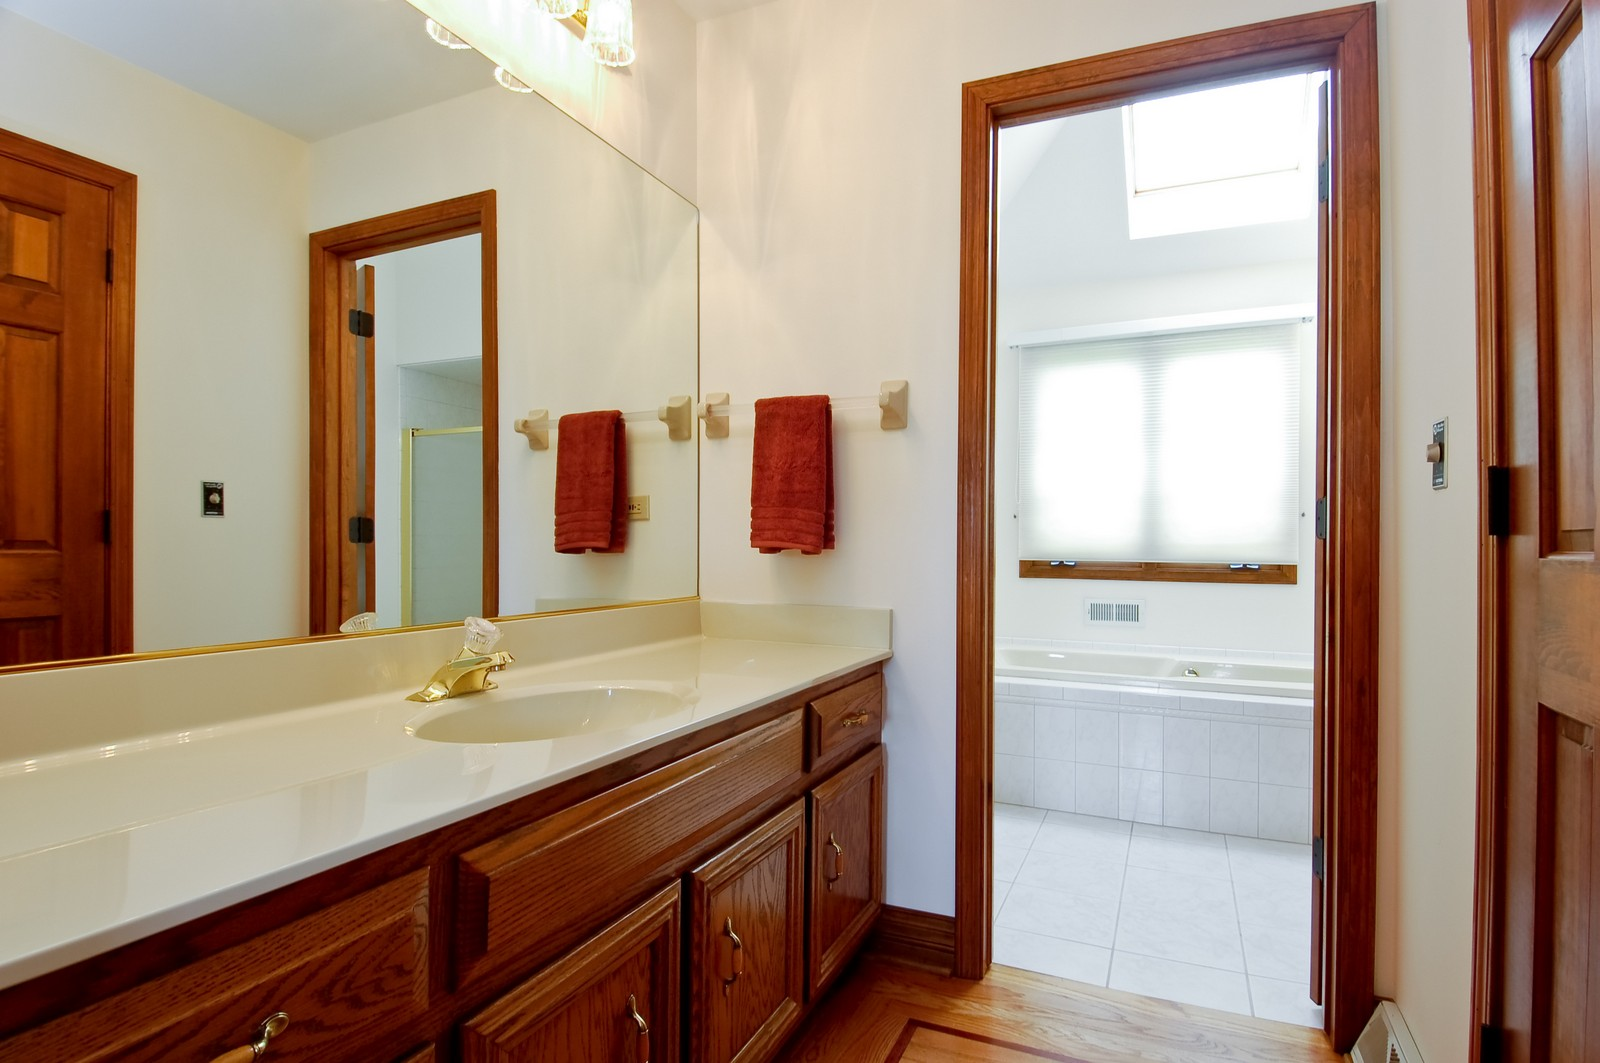 Real Estate Photography - 1S560 Verdun, Winfield, IL, 60190 - Master Bathroom